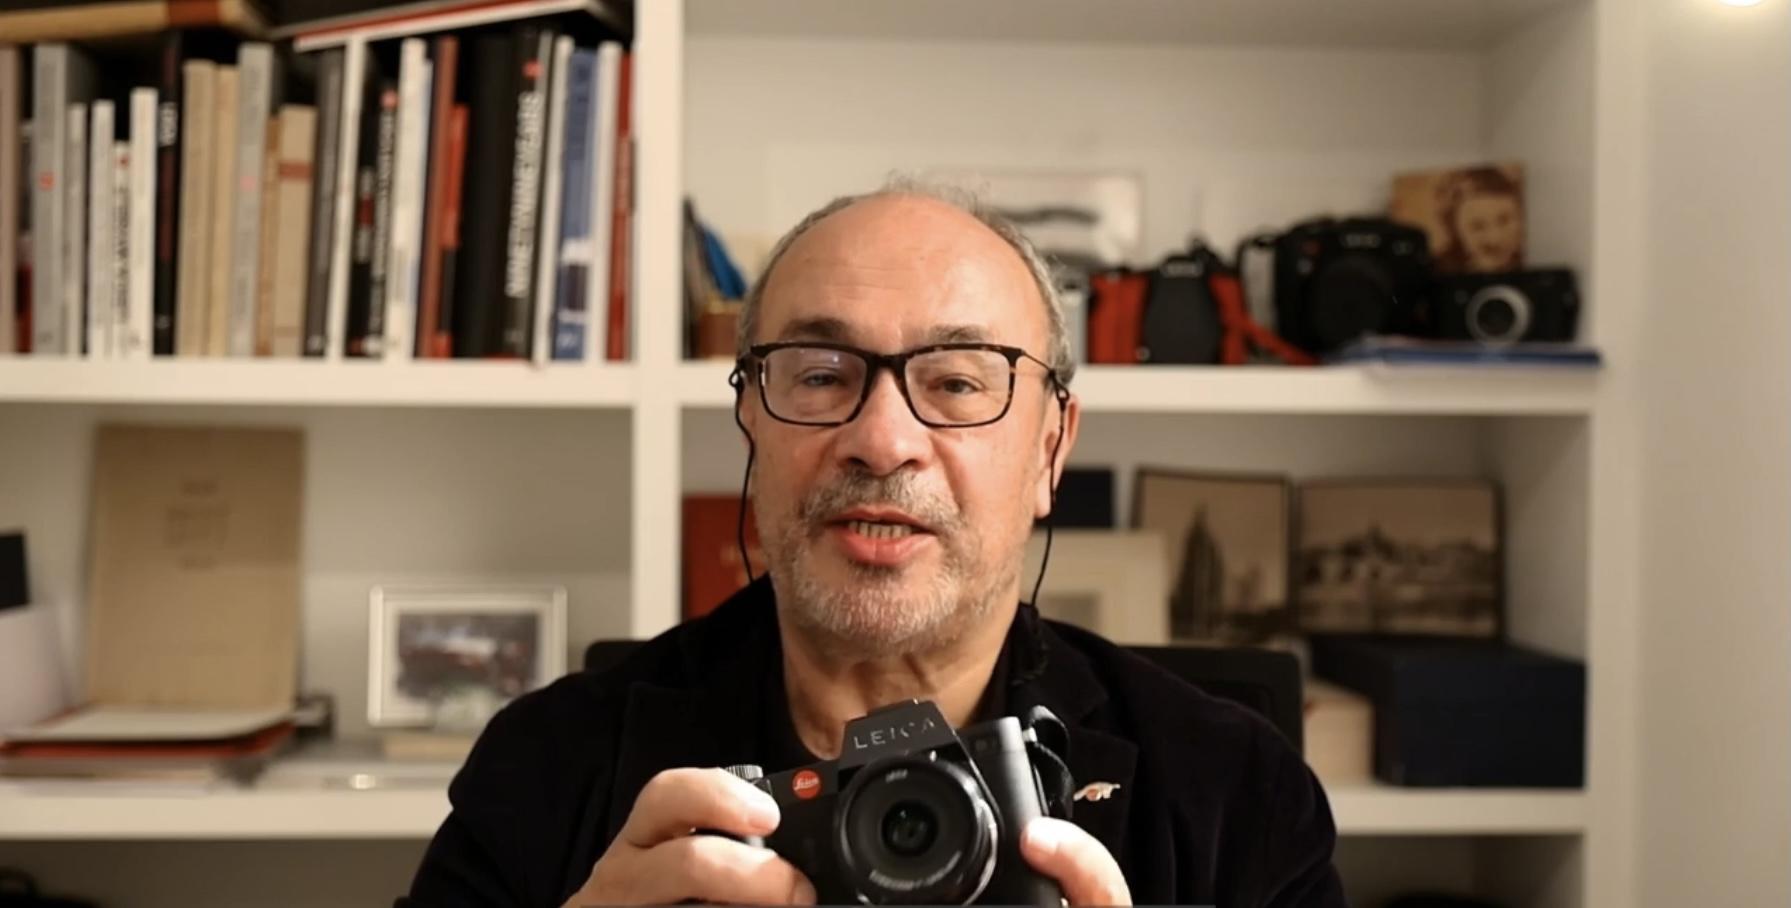 【Leica】新製品 ライカ SL2-S オンラインプレス発表会